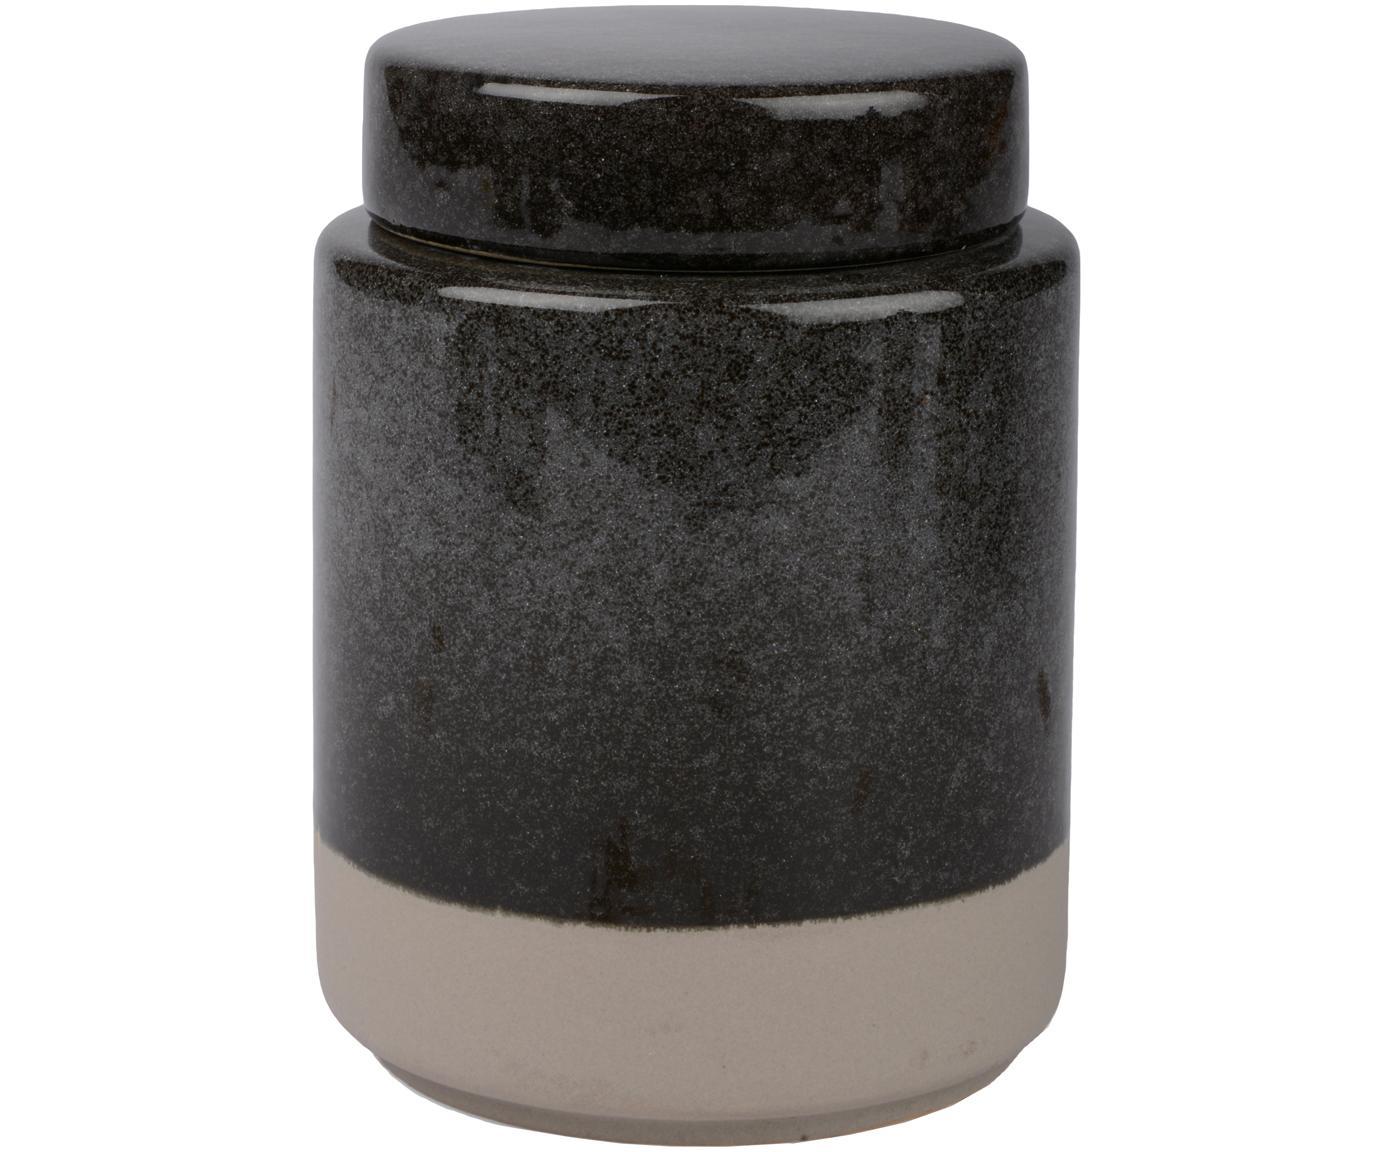 Opbergpot Grego, Keramiek, Donkergrijs, beige, Ø 9 cm